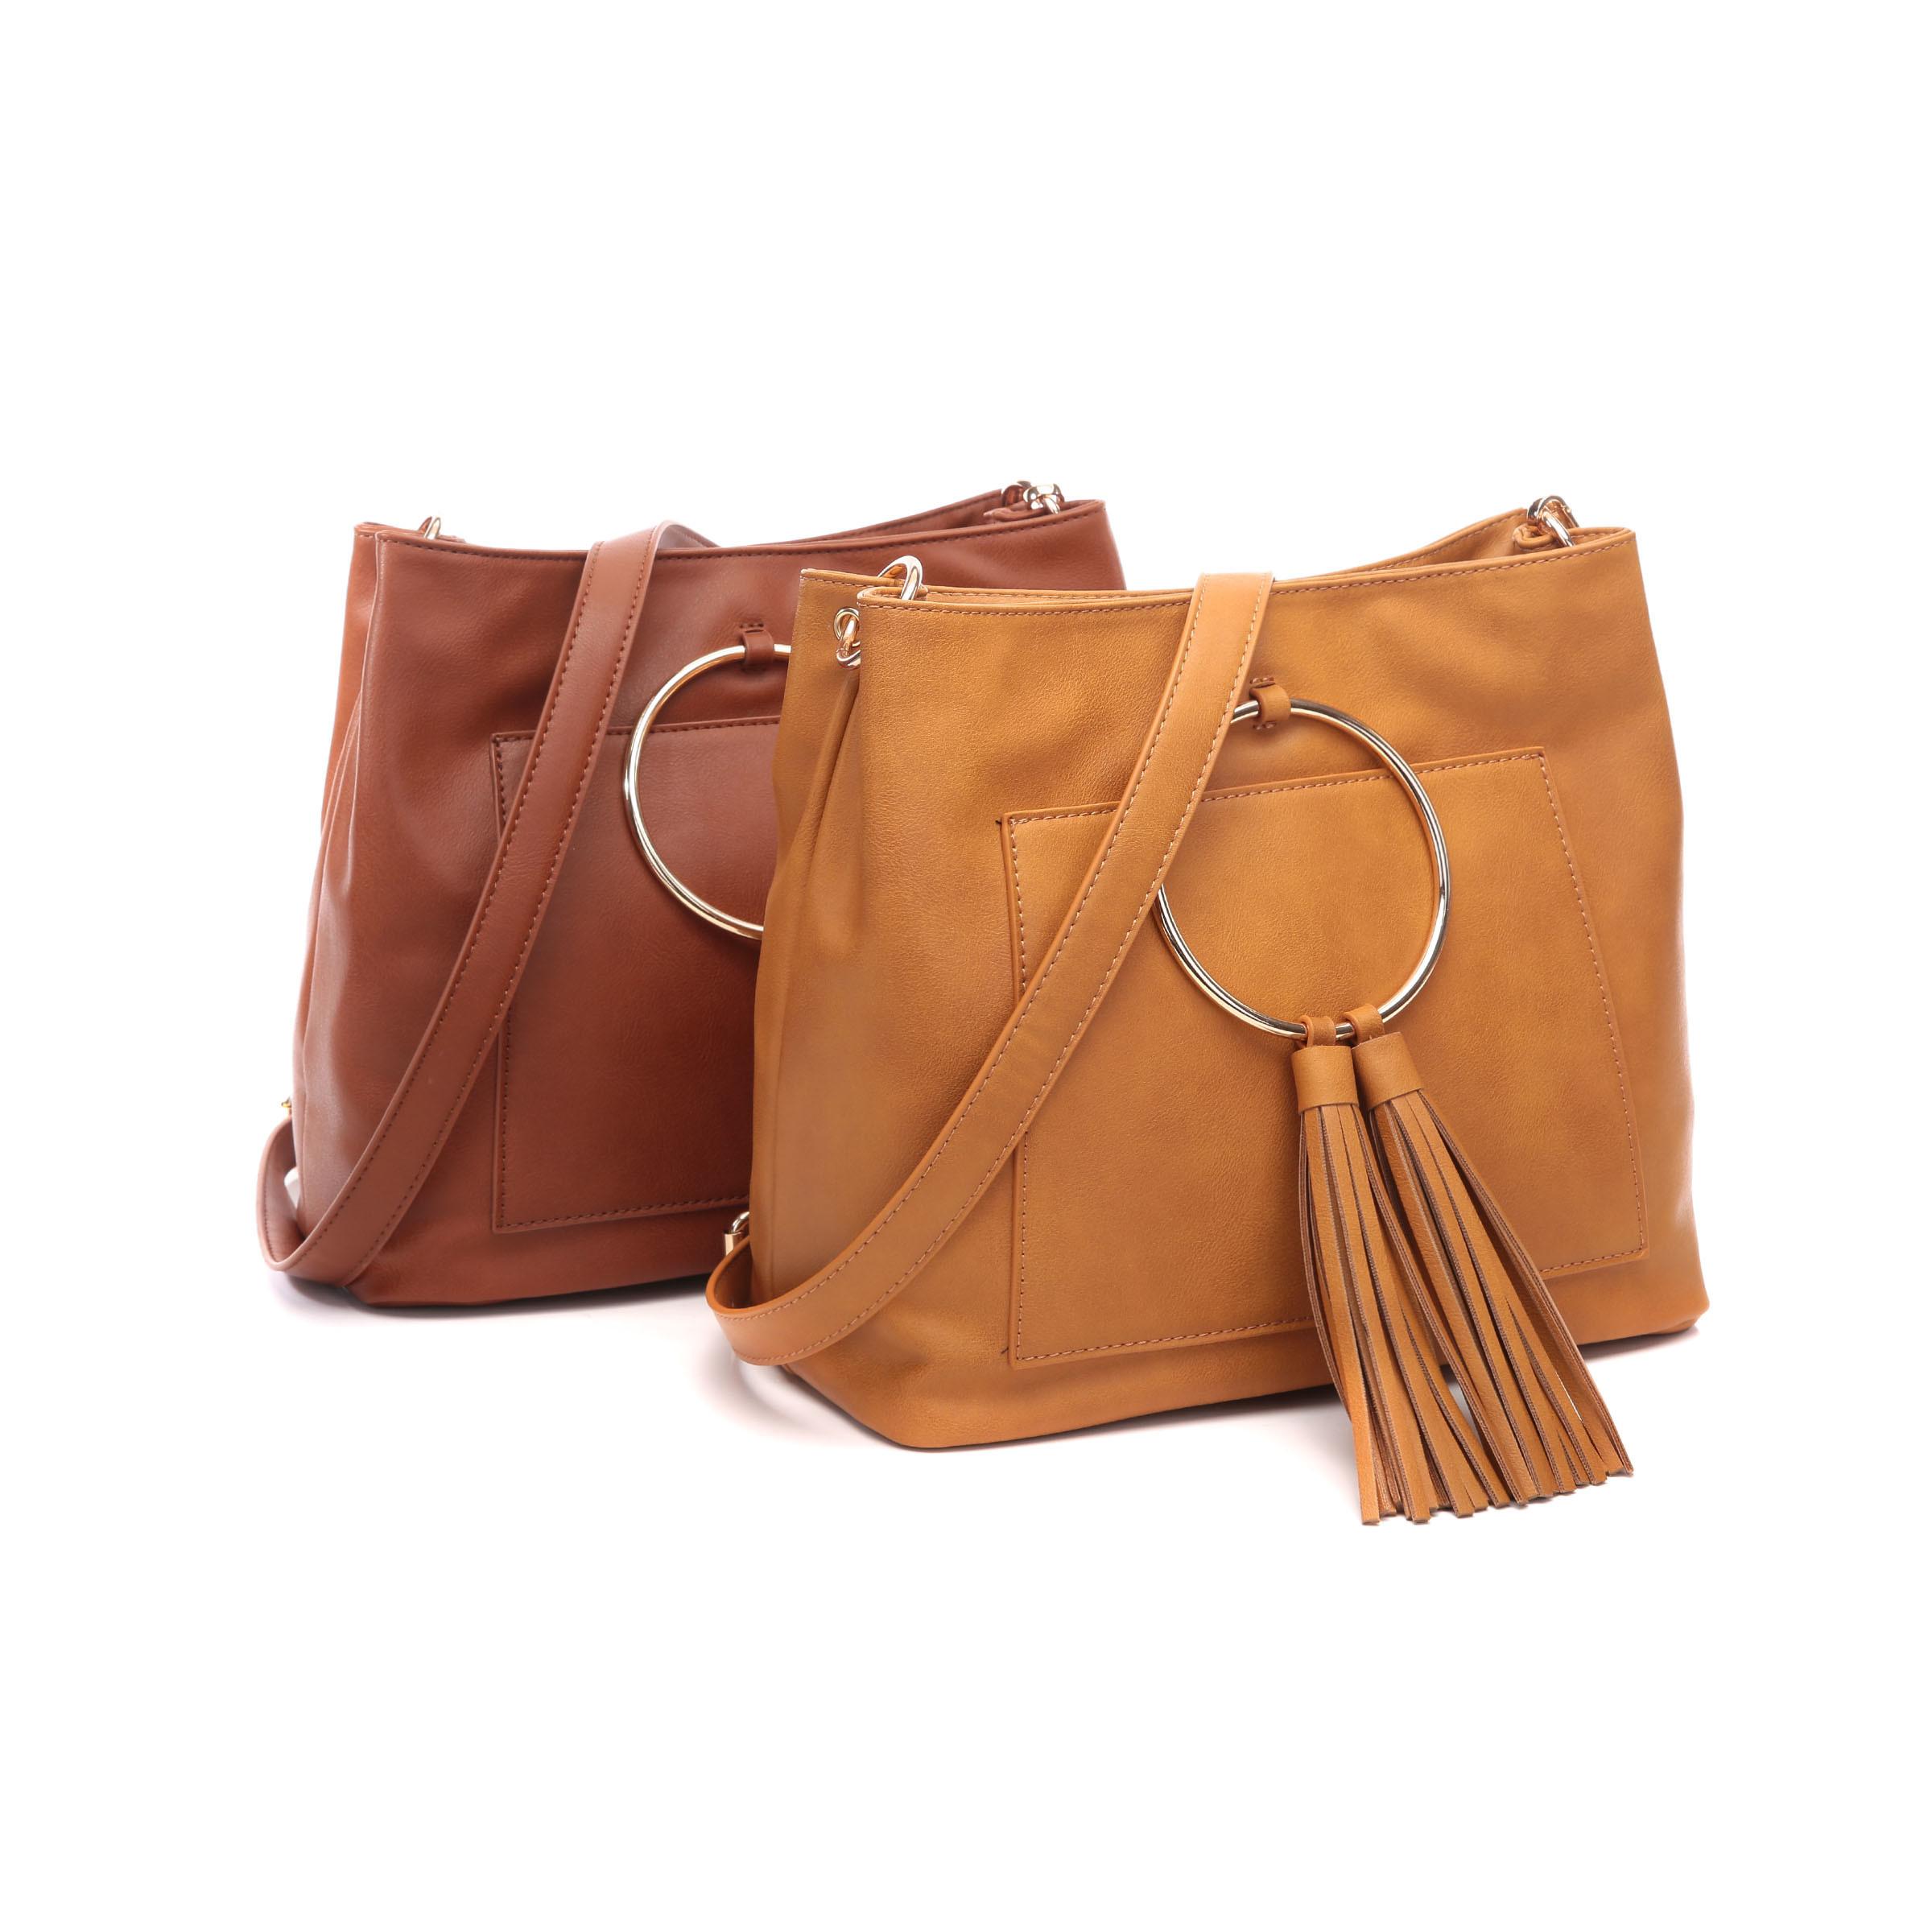 9684722756f5 China New Women Bags Ladies Famous Casual Tote Bag Elegant PU Leather Bag  Designer High Quality Handbag - China Tote Bag Leather